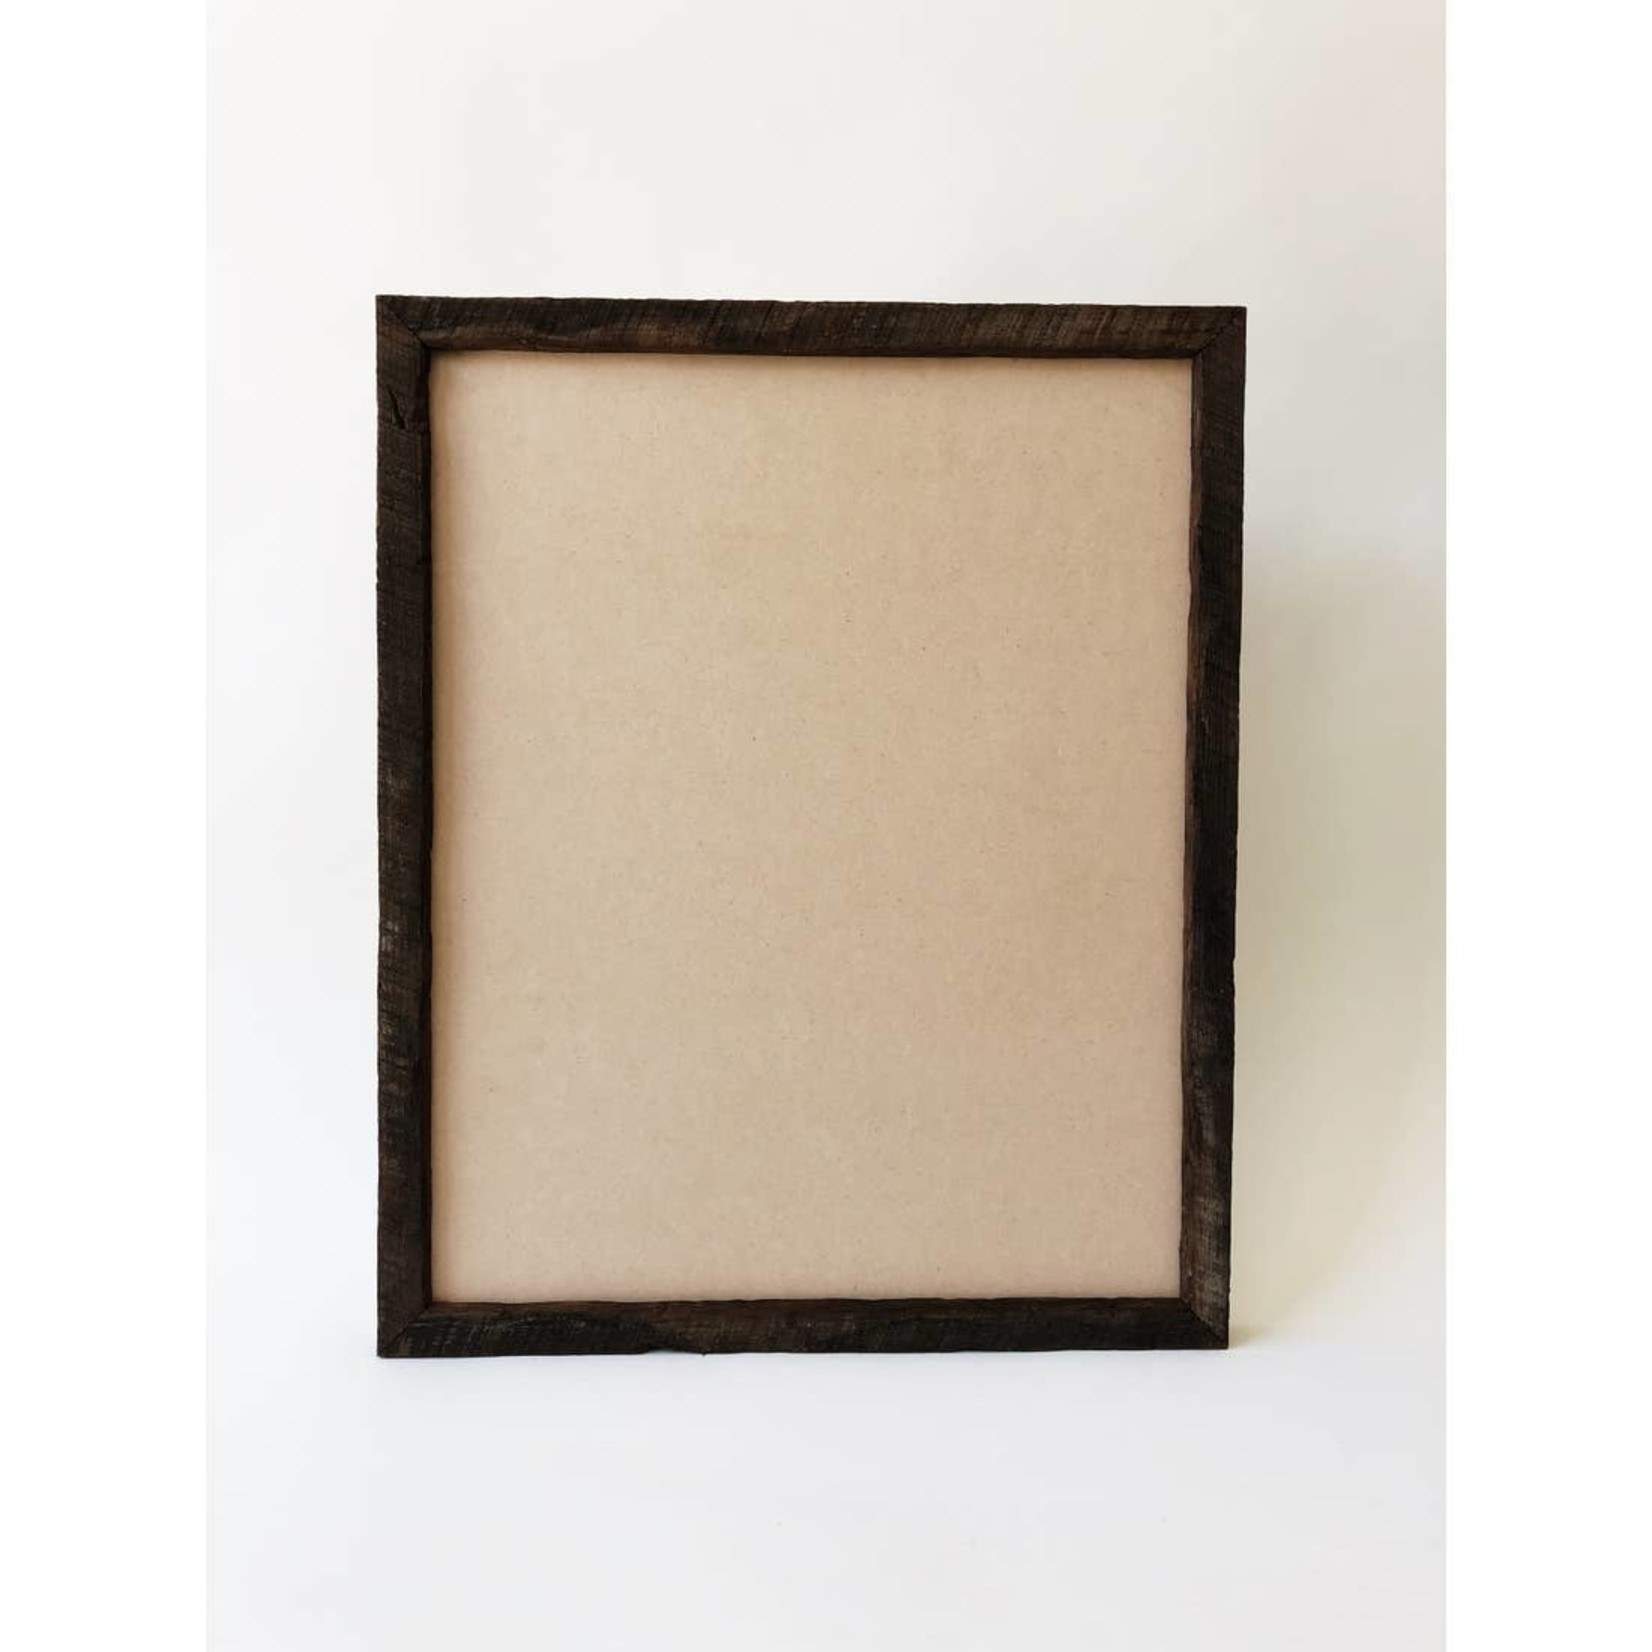 Alibi Interiors Alibi Reclaimed Wood Gallery Frame 16x20